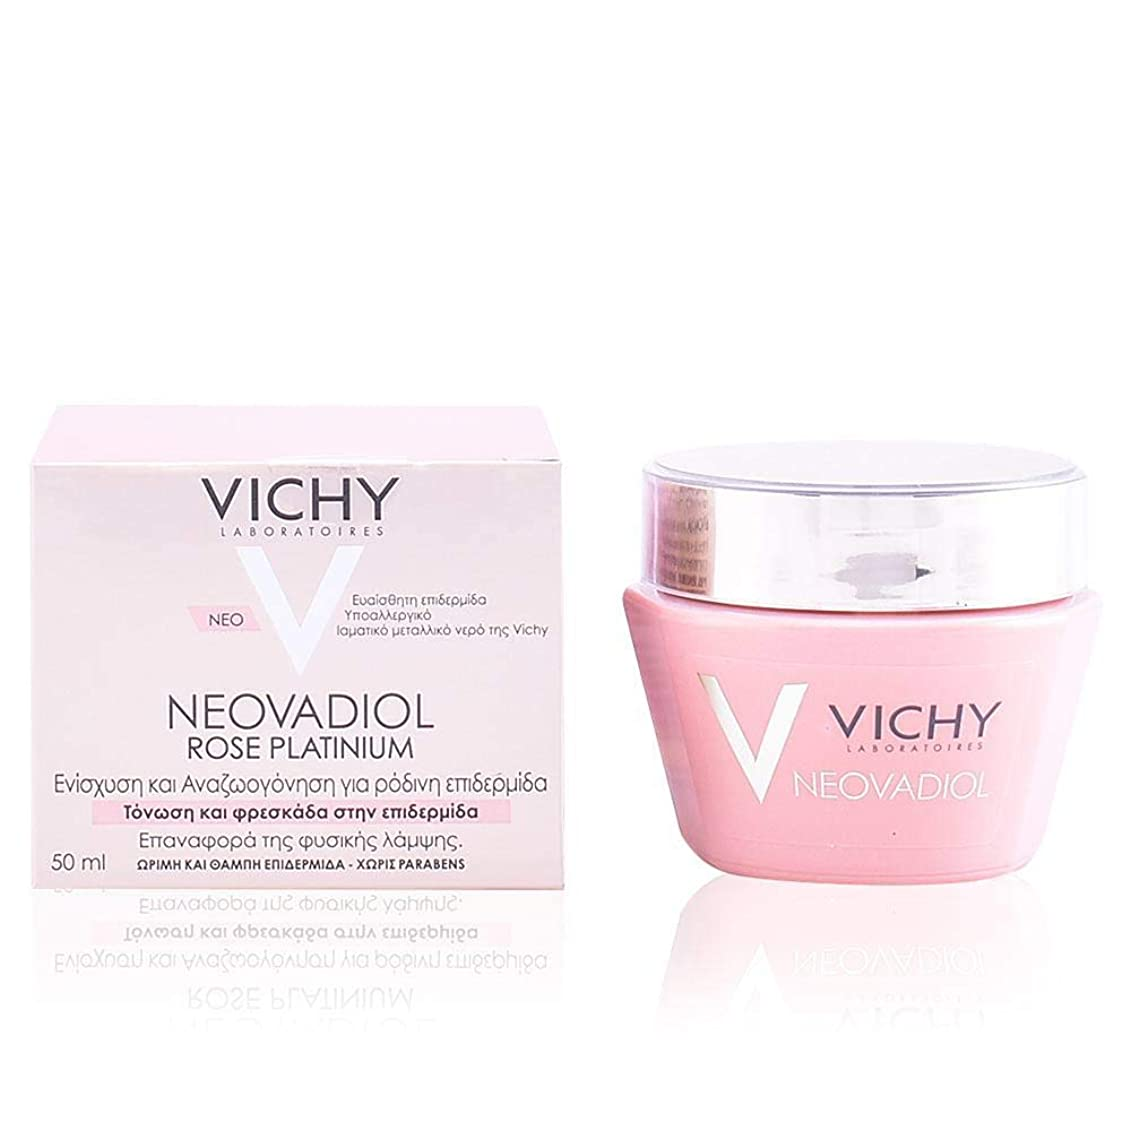 食料品店ご近所増幅器Vichy Neovadiol Rose Platinium Cream 50ml [並行輸入品]